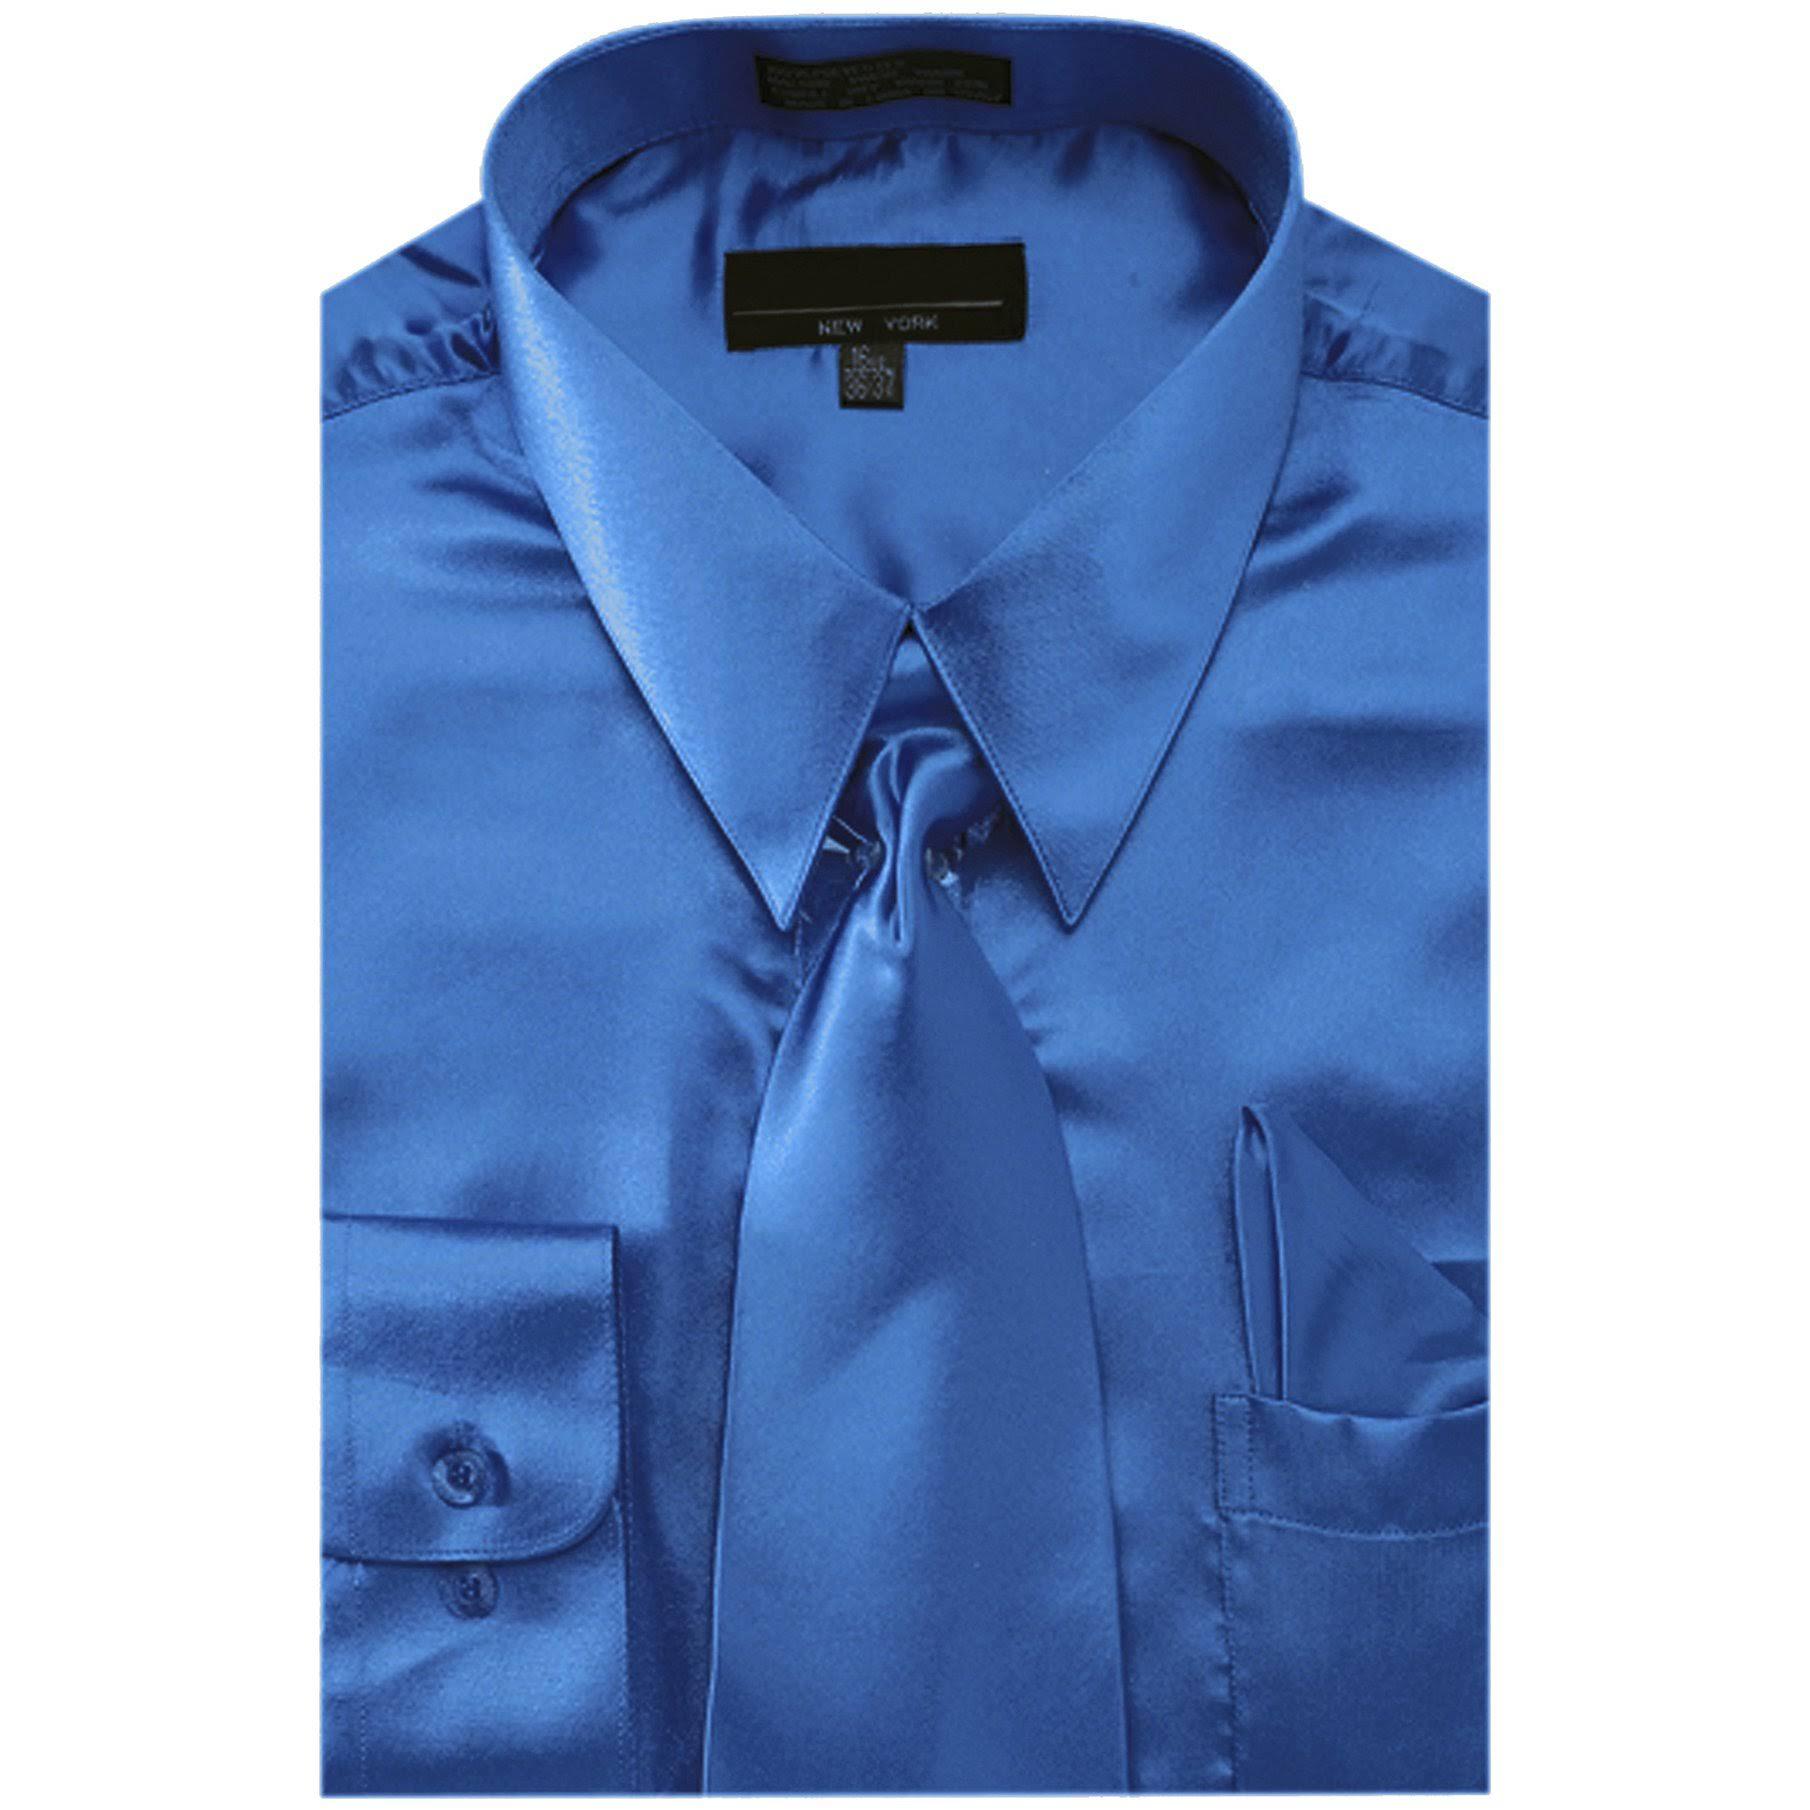 155 Hombres 3435 Camisa Color roy ds3012np2 Outlet Ntp Sunrise Y Corbata Satén Para Vestir En De Pañuelo Royal Liso zTagxAqBw